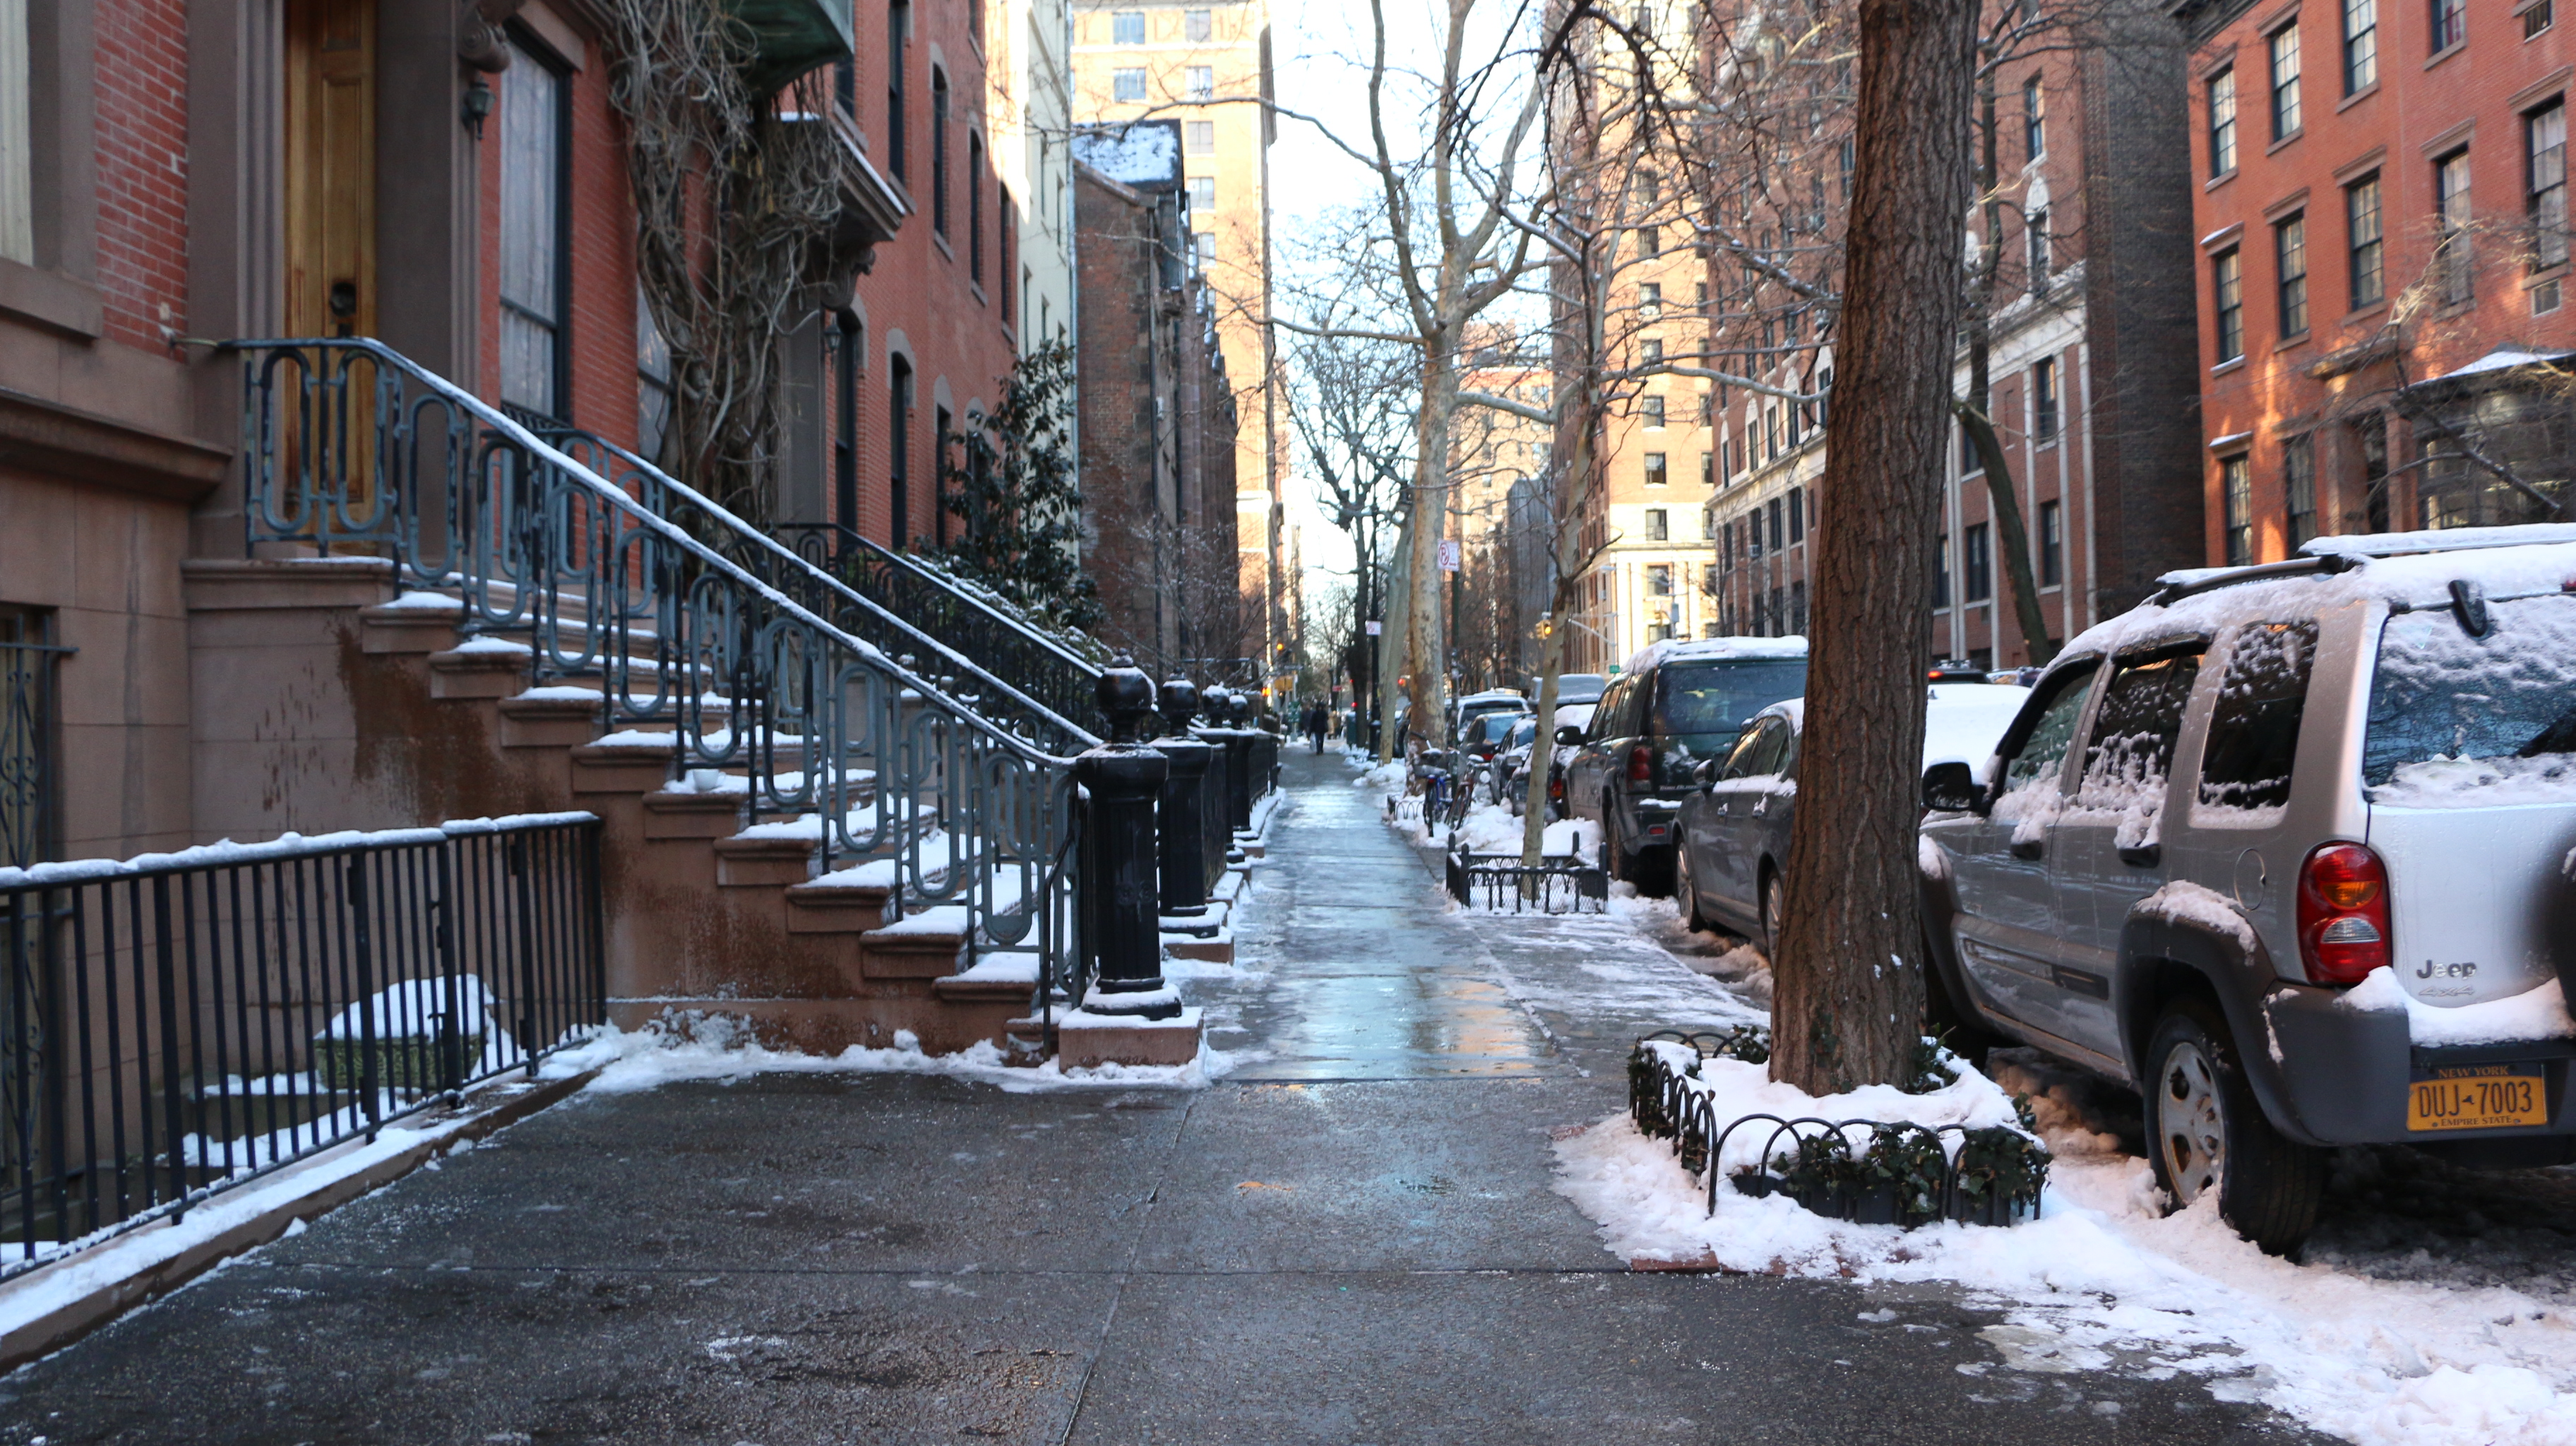 Upper East Side photo blog